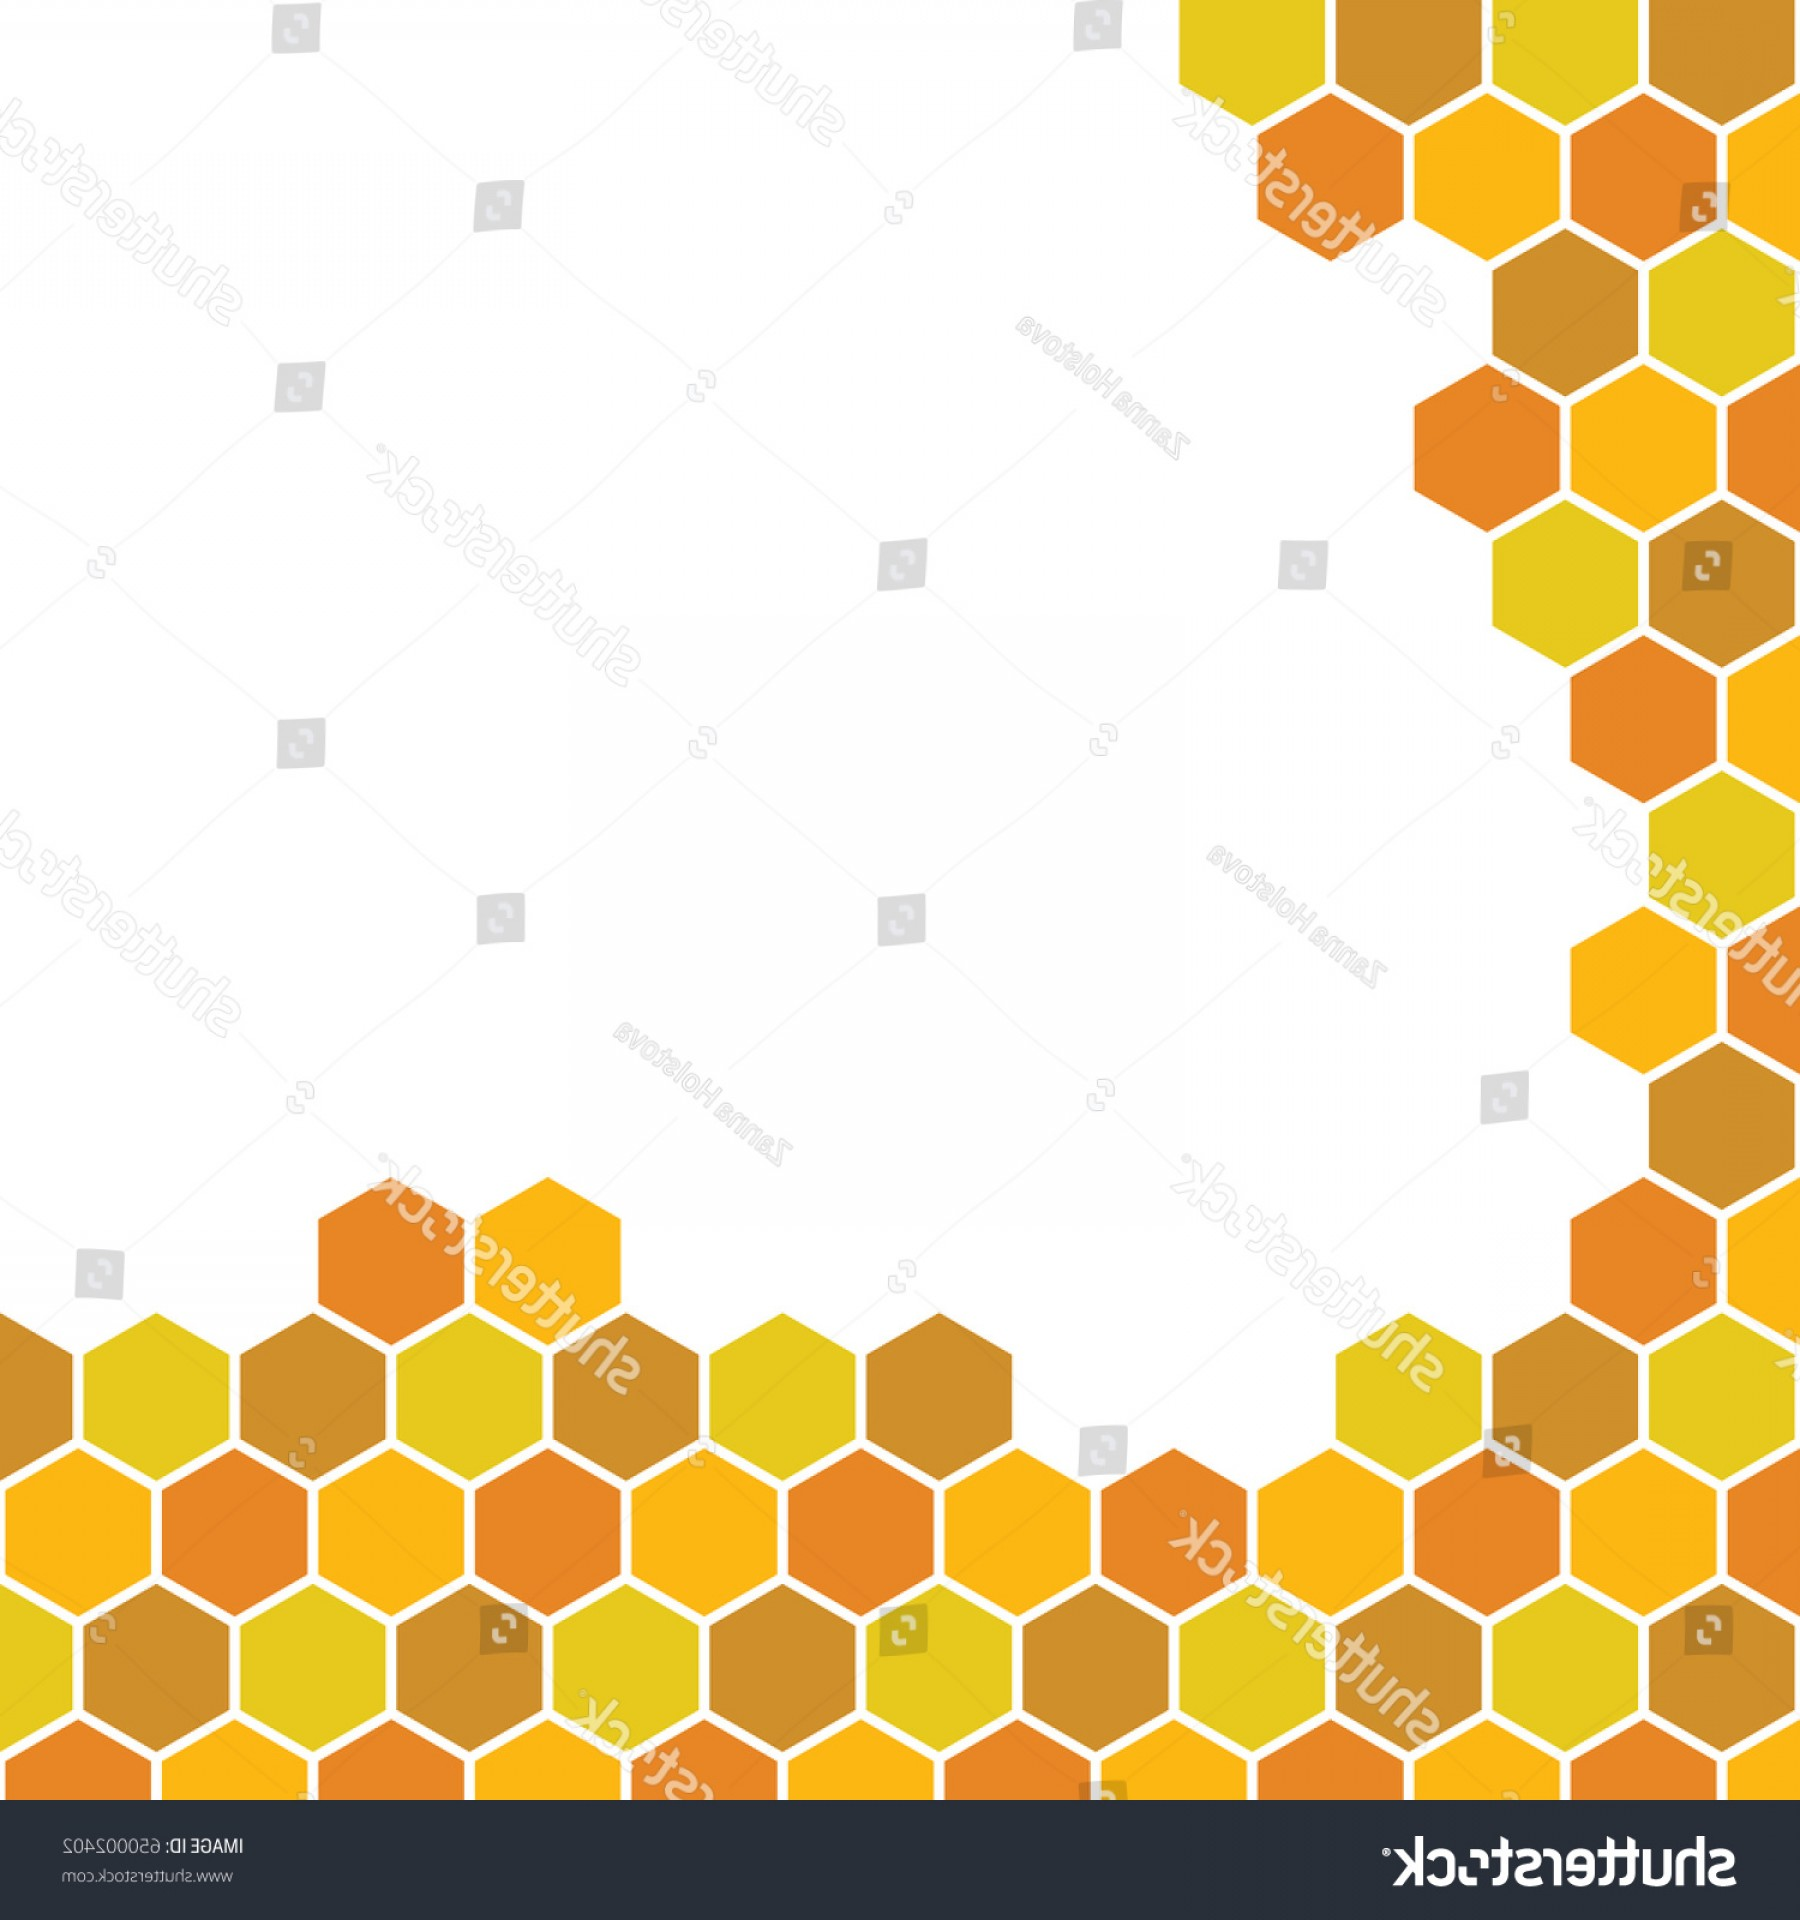 1800x1920 Bee Honeycomb Pattern Vector Backgrounds Honey Lazttweet